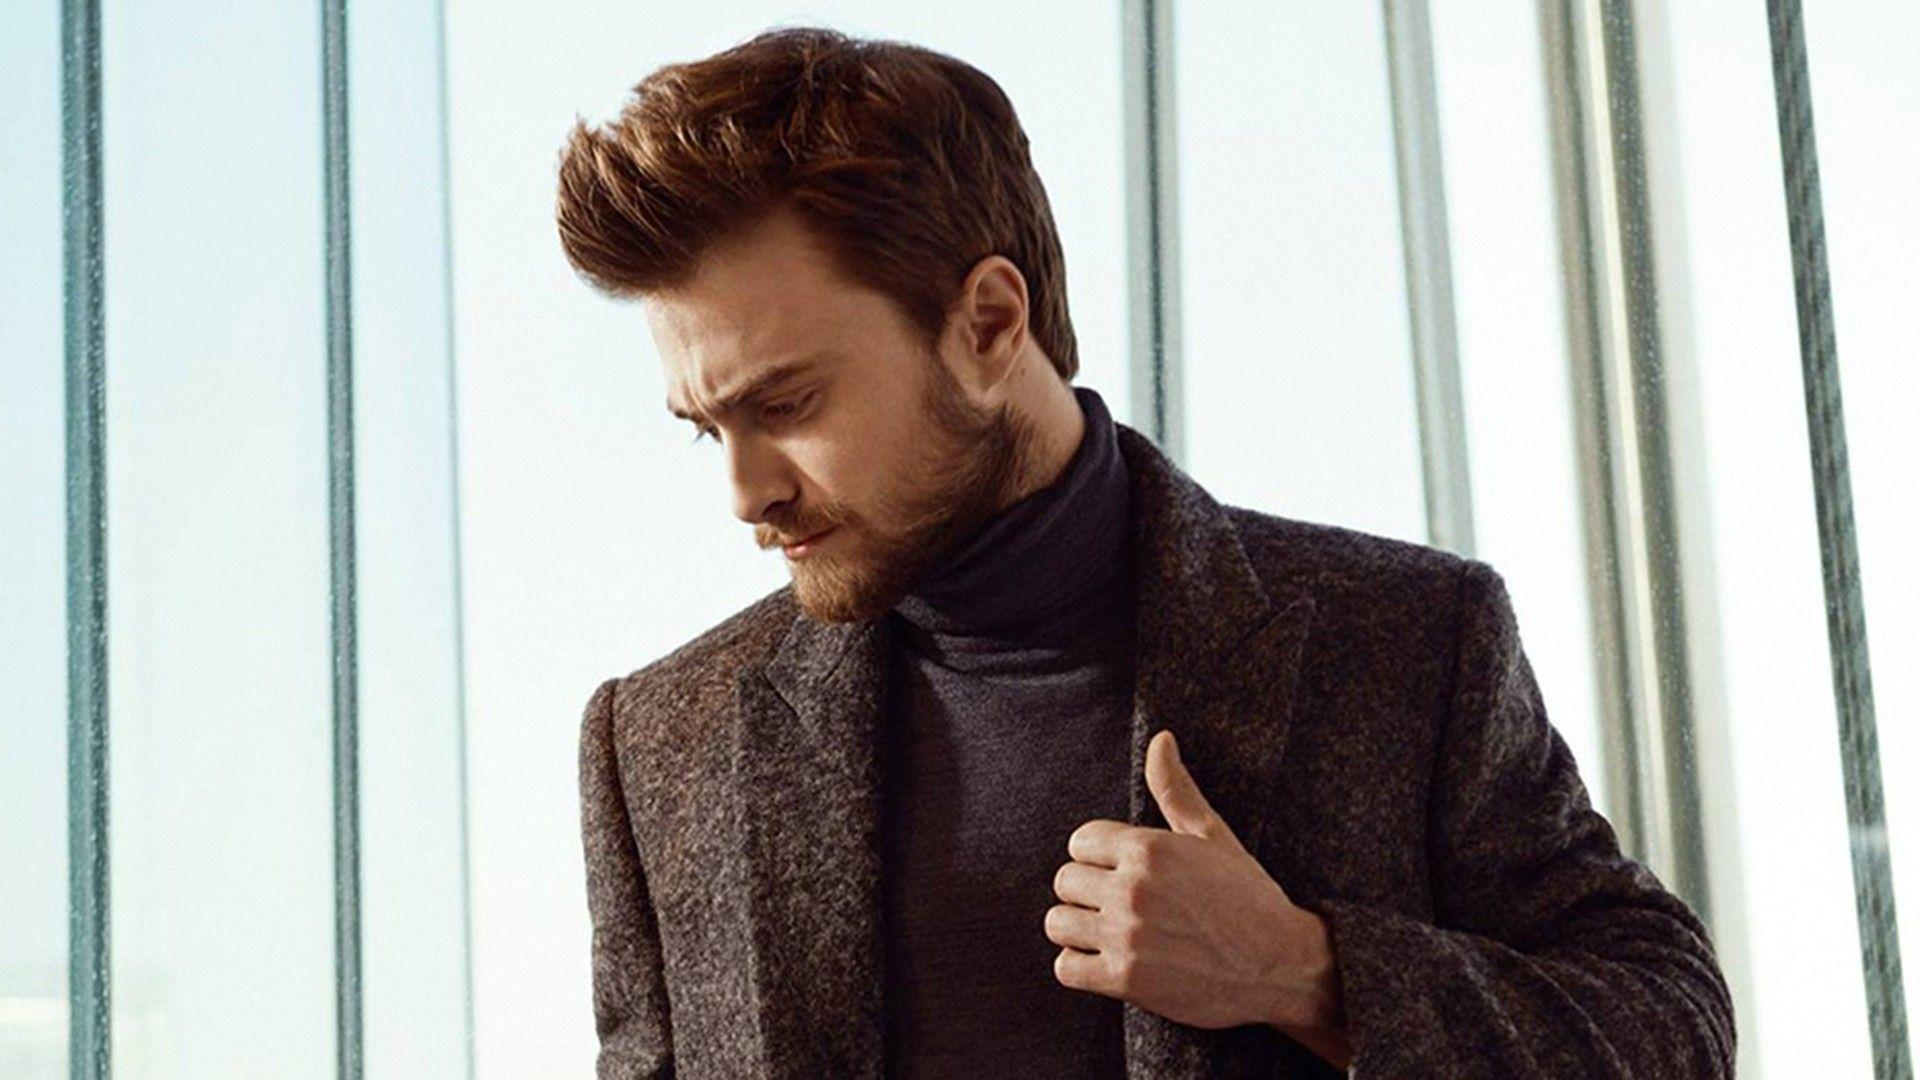 Daniel Radcliffe 2017 Wallpapers - Wallpaper Cave